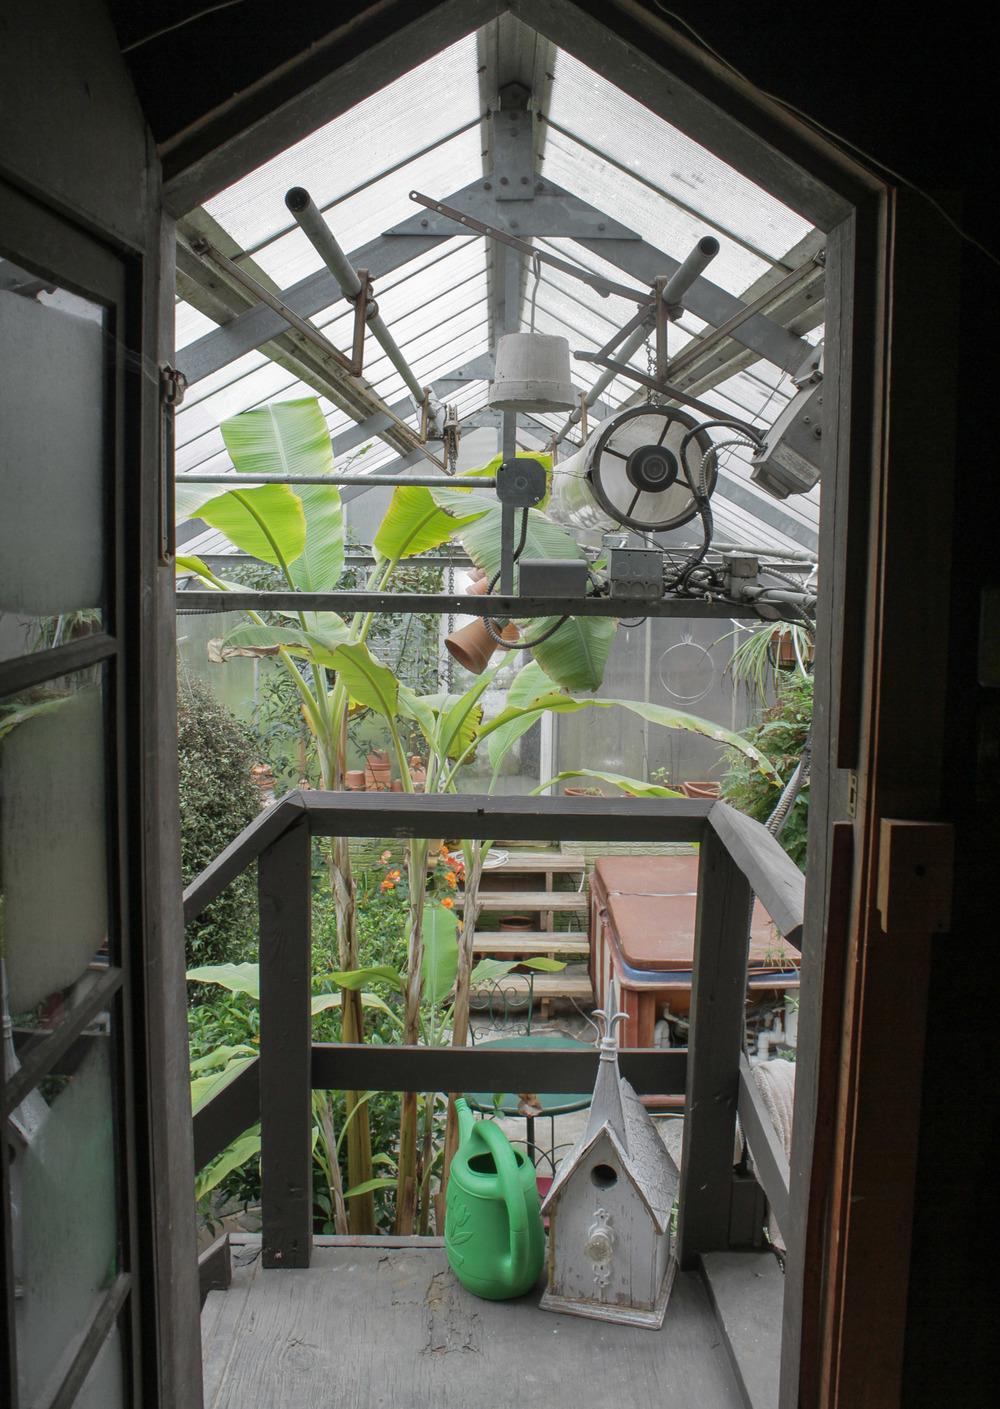 FOWLER, OHIO: air bnb solar powered greenhouse